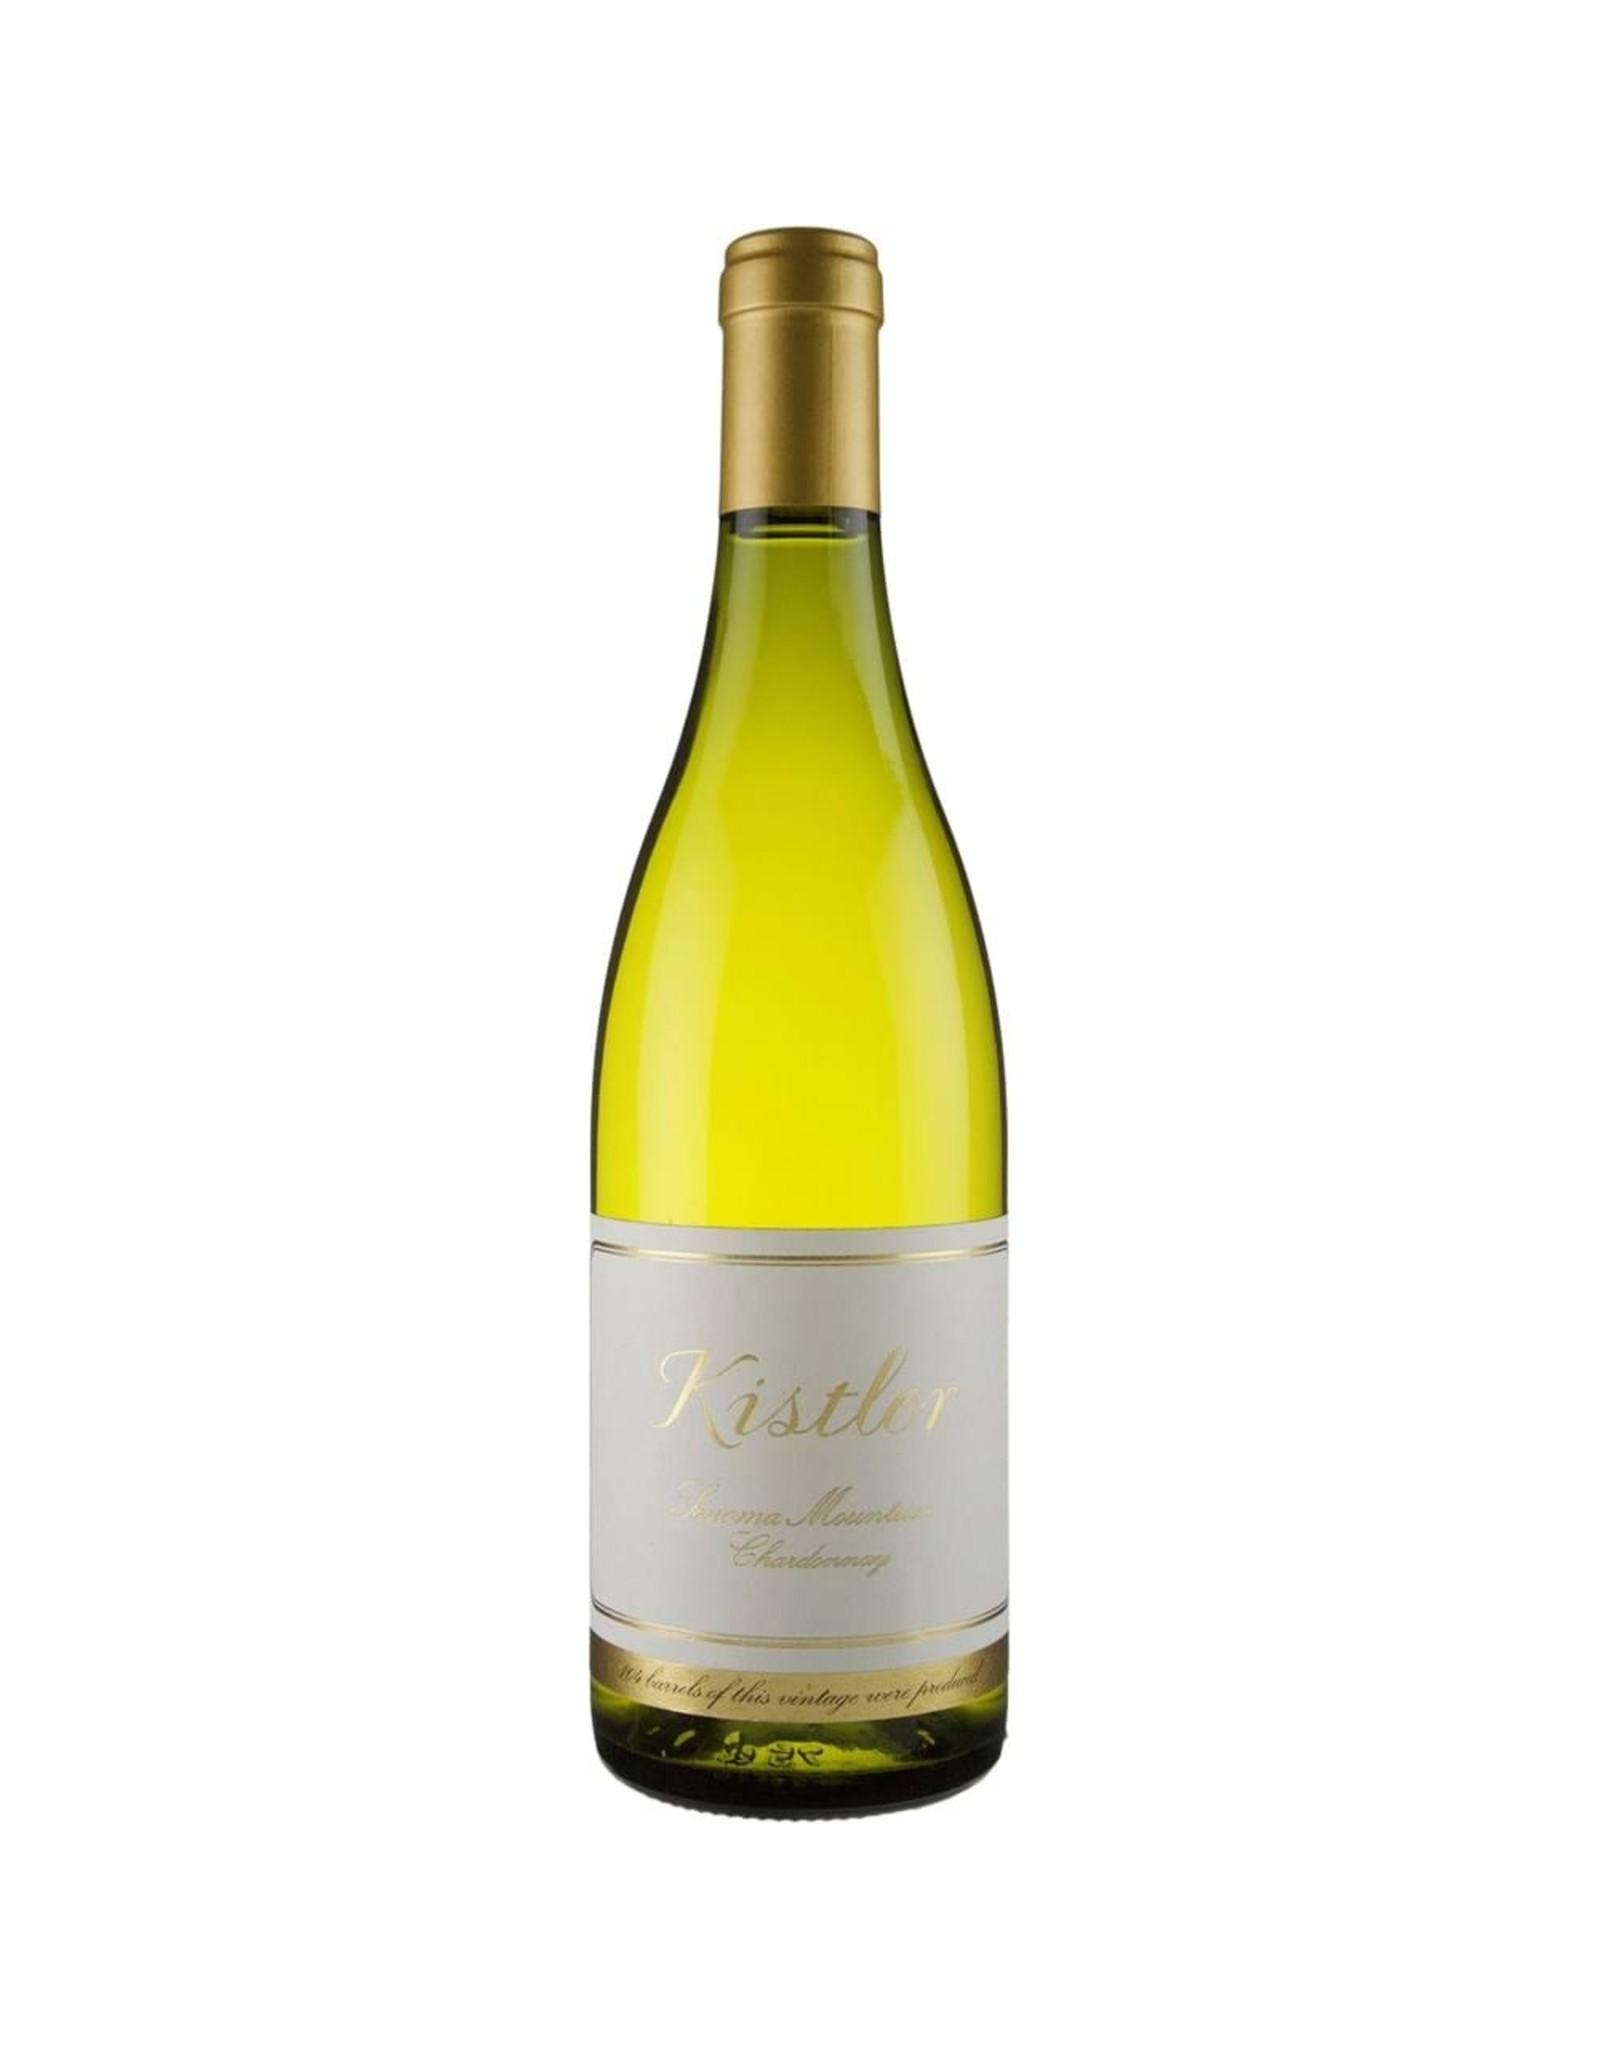 Kistler Chardonnay